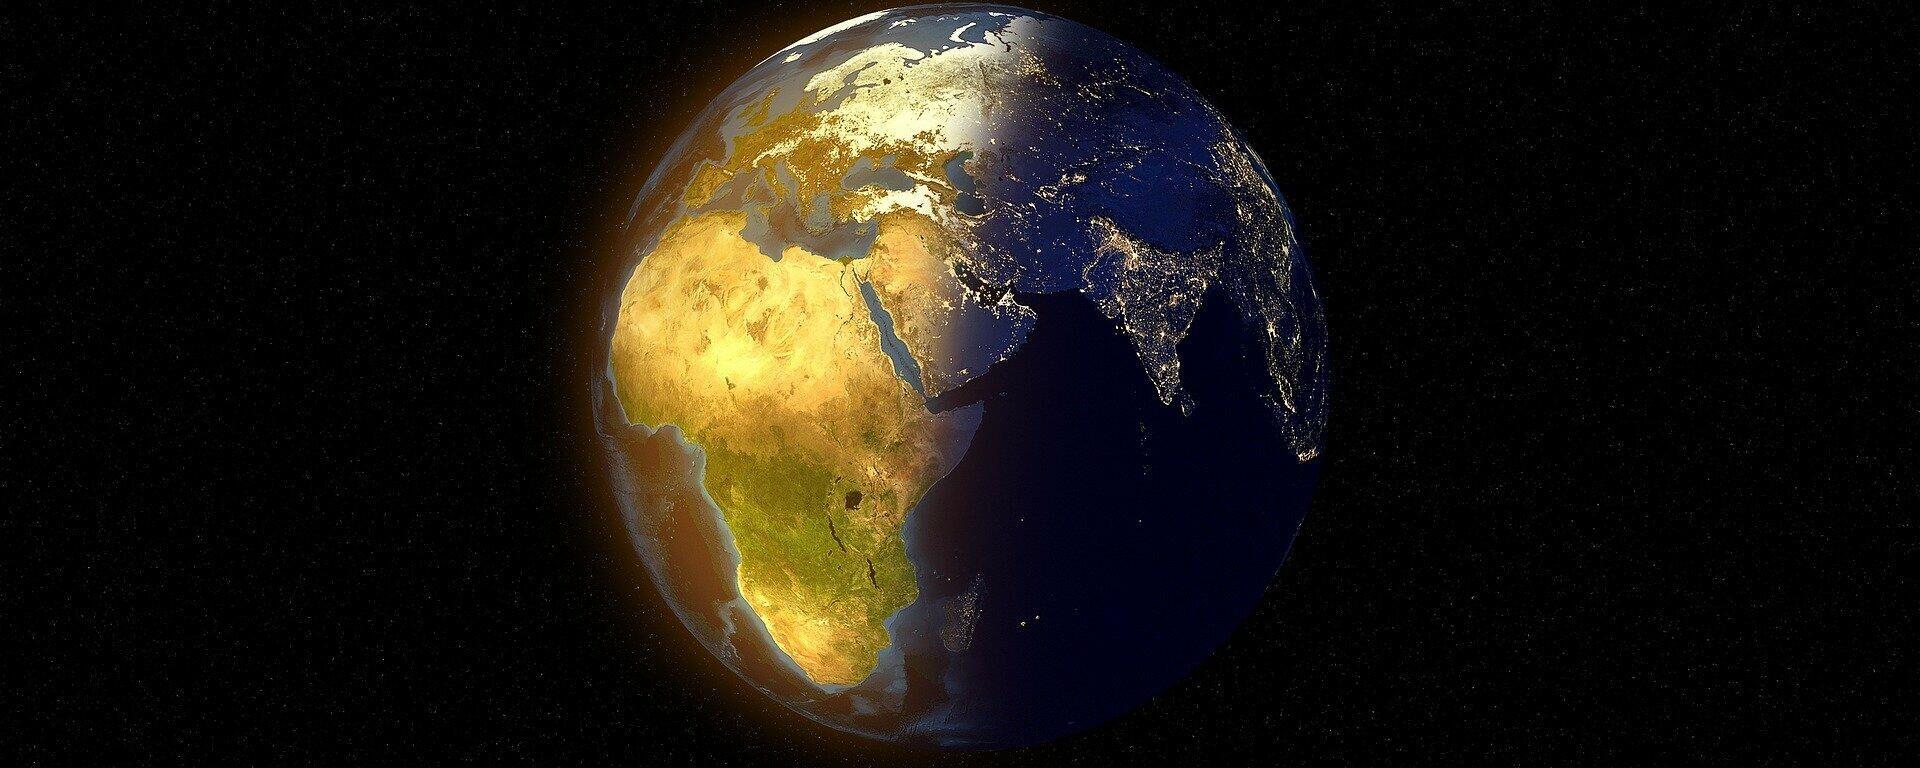 El globo terráqueo - Sputnik Mundo, 1920, 22.09.2021